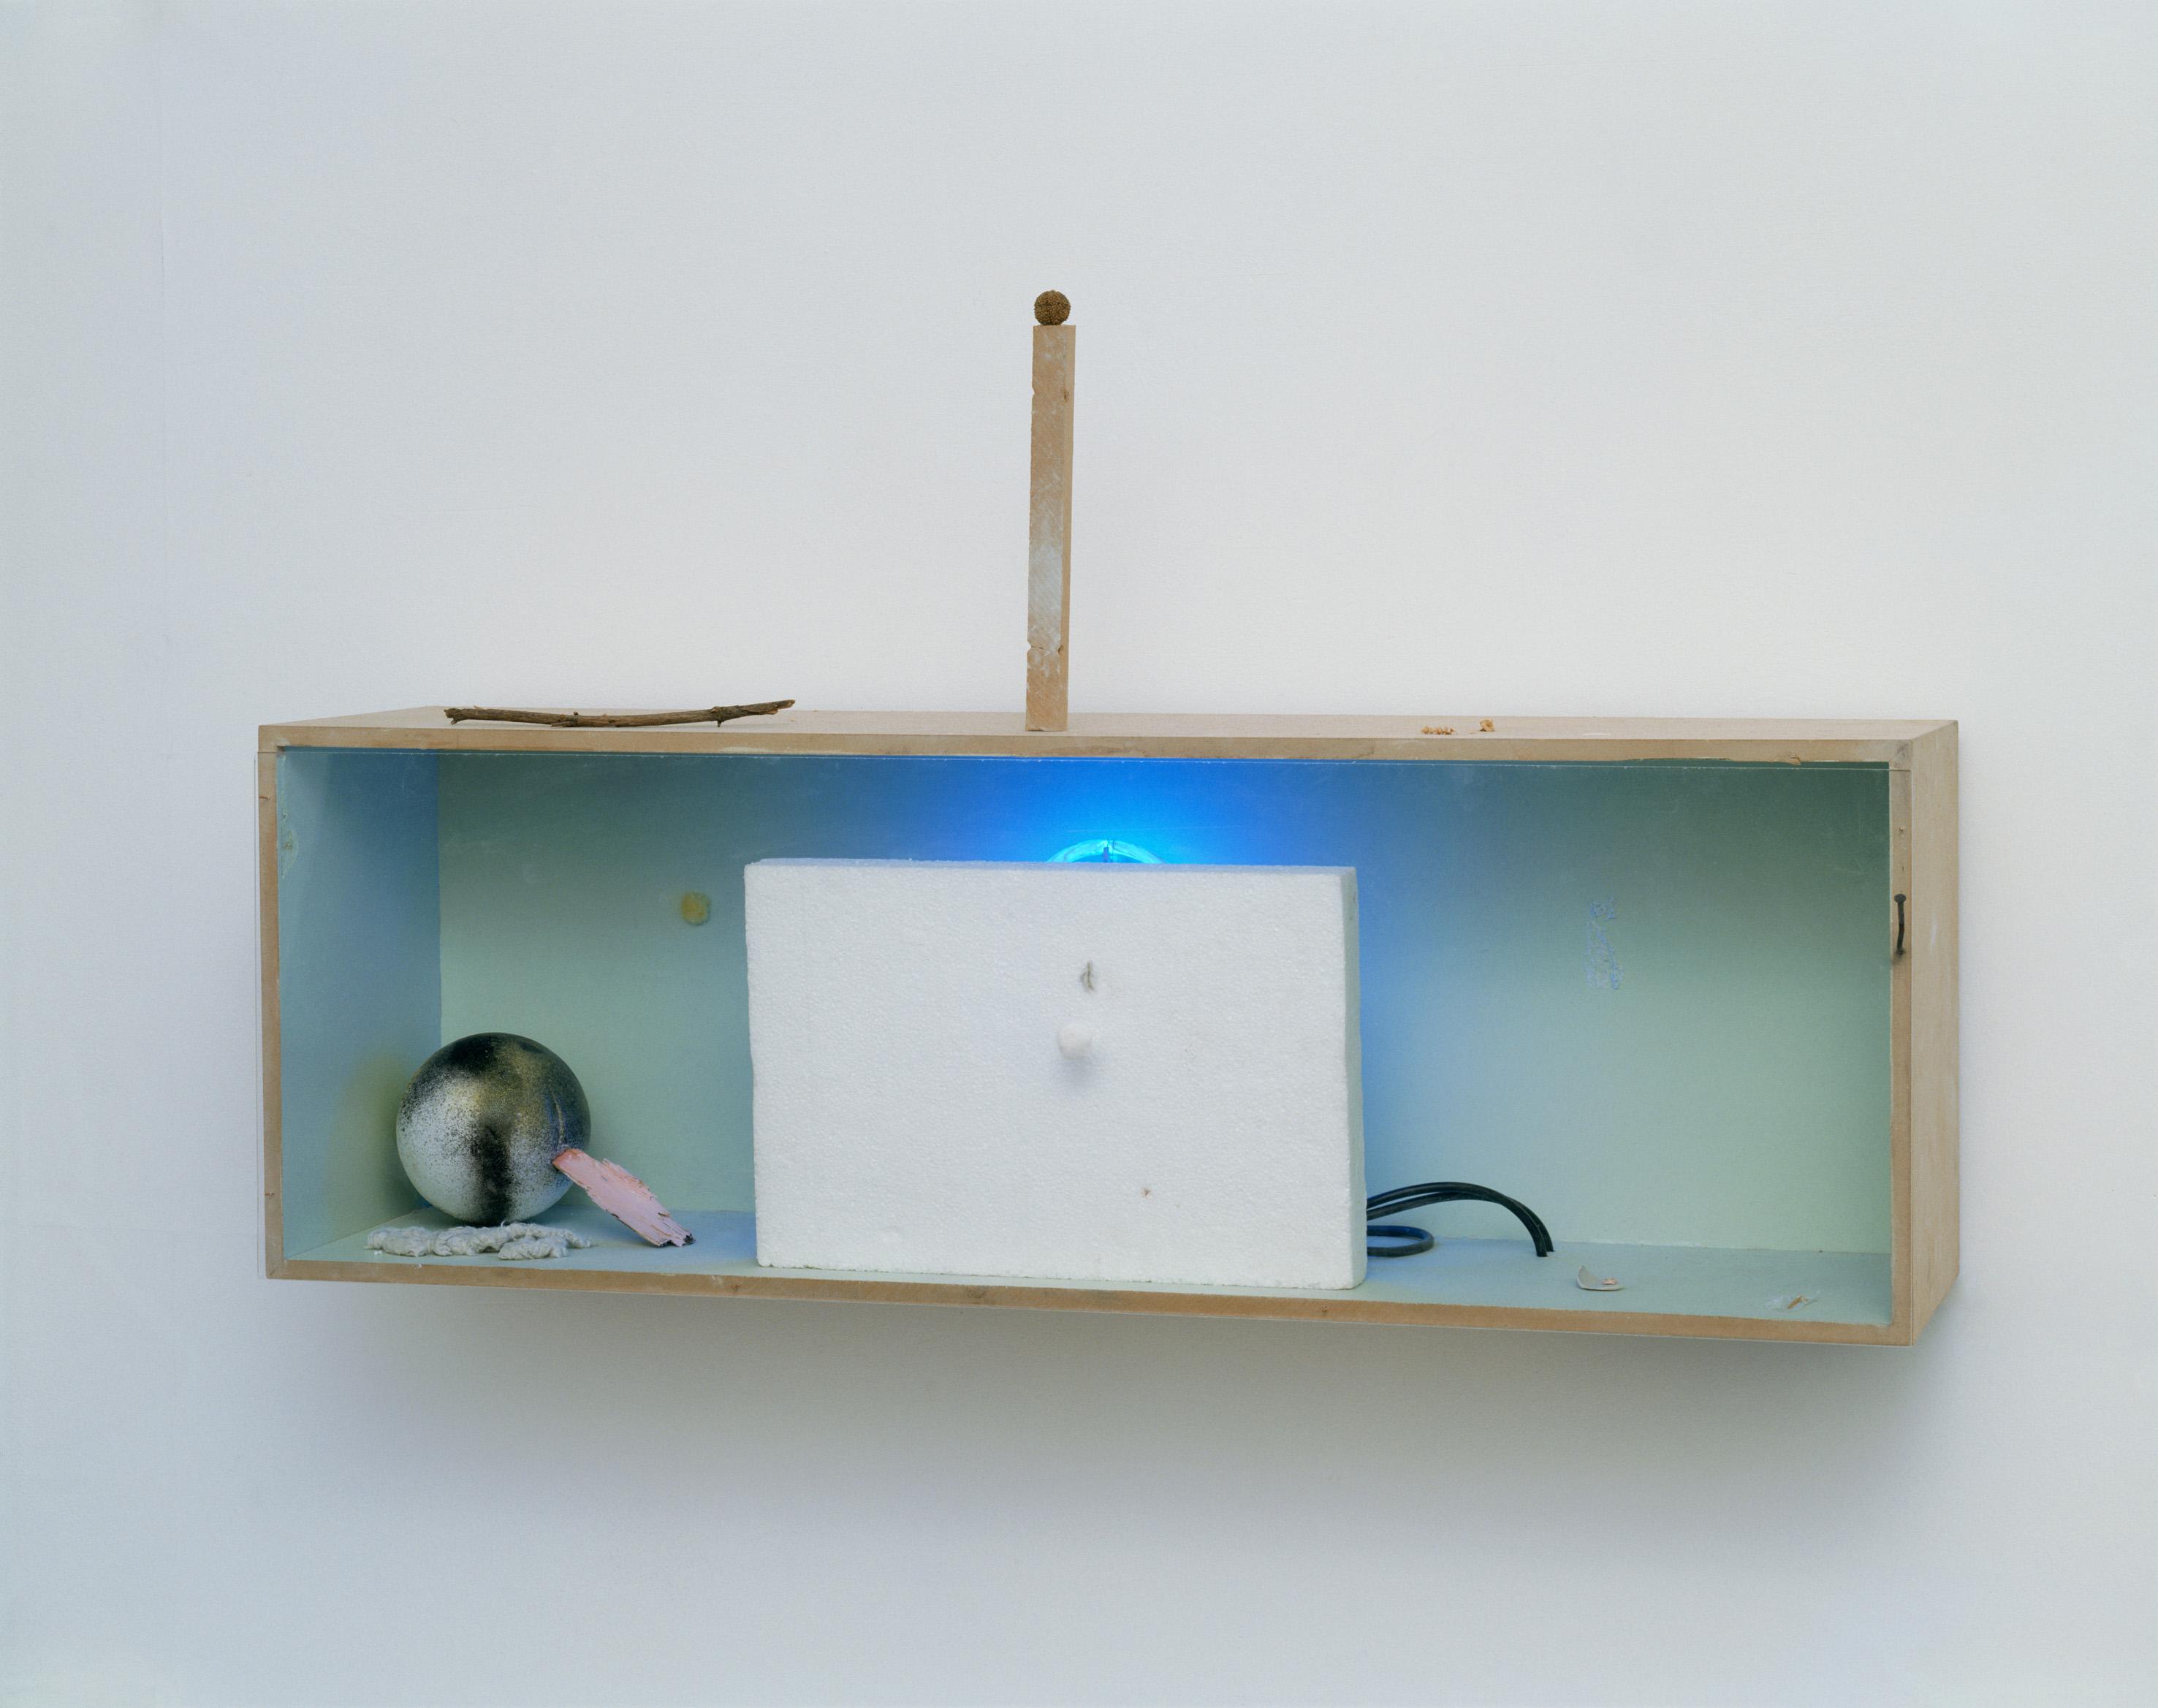 Rebecca Warren, The Living, 2005 © Rebecca Warren. Courtesy Maureen Paley, Galerie Max Hetzler, und Matthew Marks Gallery.